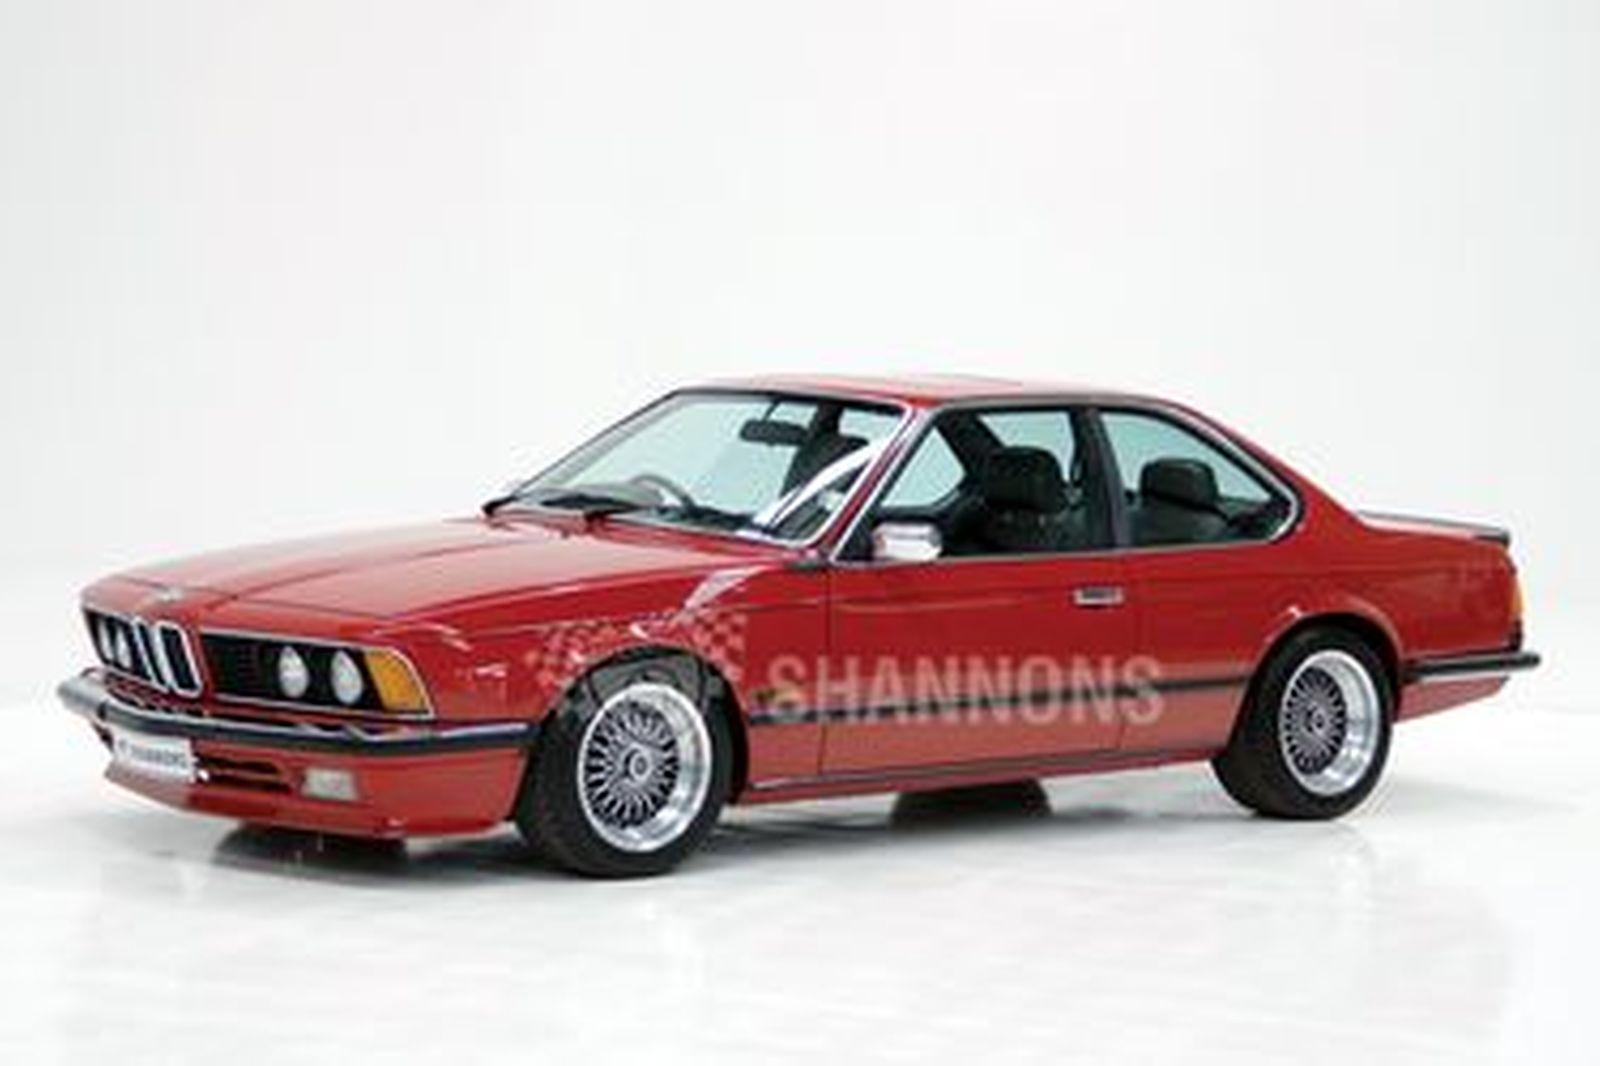 sold bmw 635csi manual coupe auctions lot 66 shannons rh shannons com au bmw 635csi workshop manual pdf bmw 635csi manual for sale australia